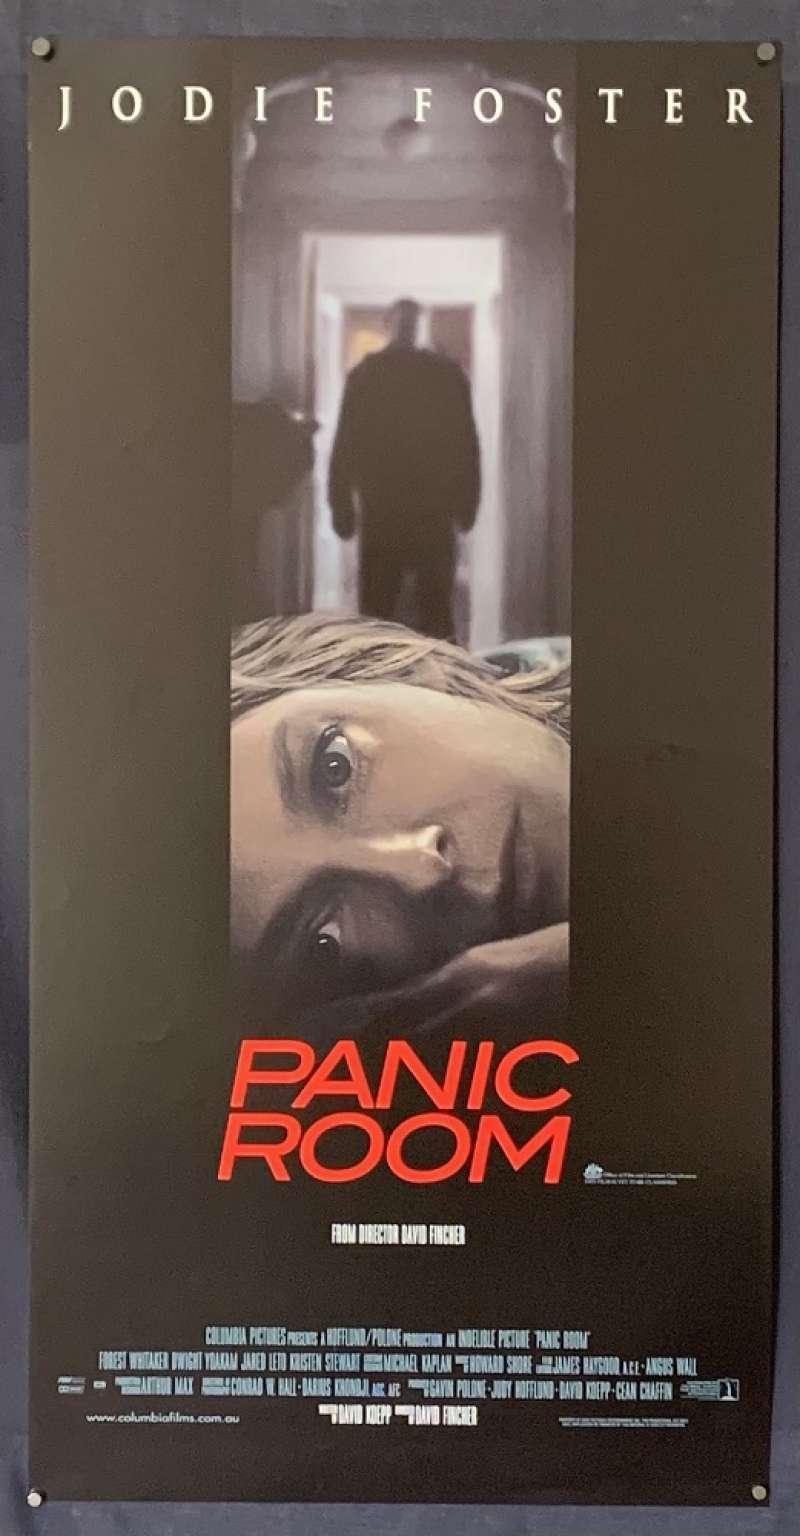 All About Movies Panic Room 2002 Daybill Movie Poster Rare Jodie Foster Kristen Stewart